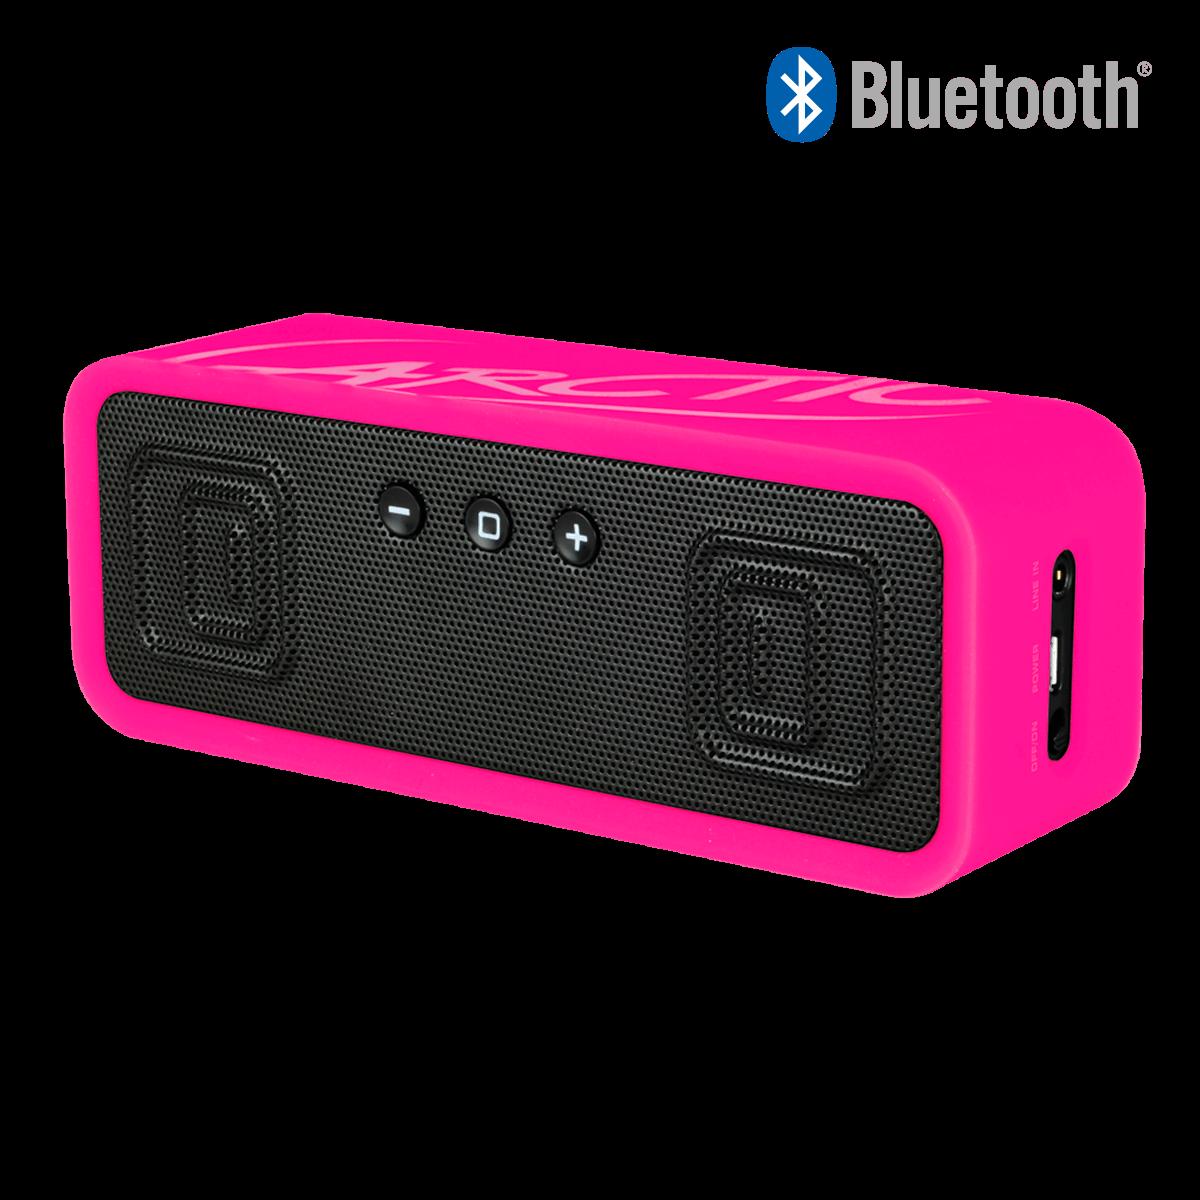 Mobiler Bluetooth 4.0 Stereo Lautsprecher mit NFC ARCTIC S113 BT | Pink